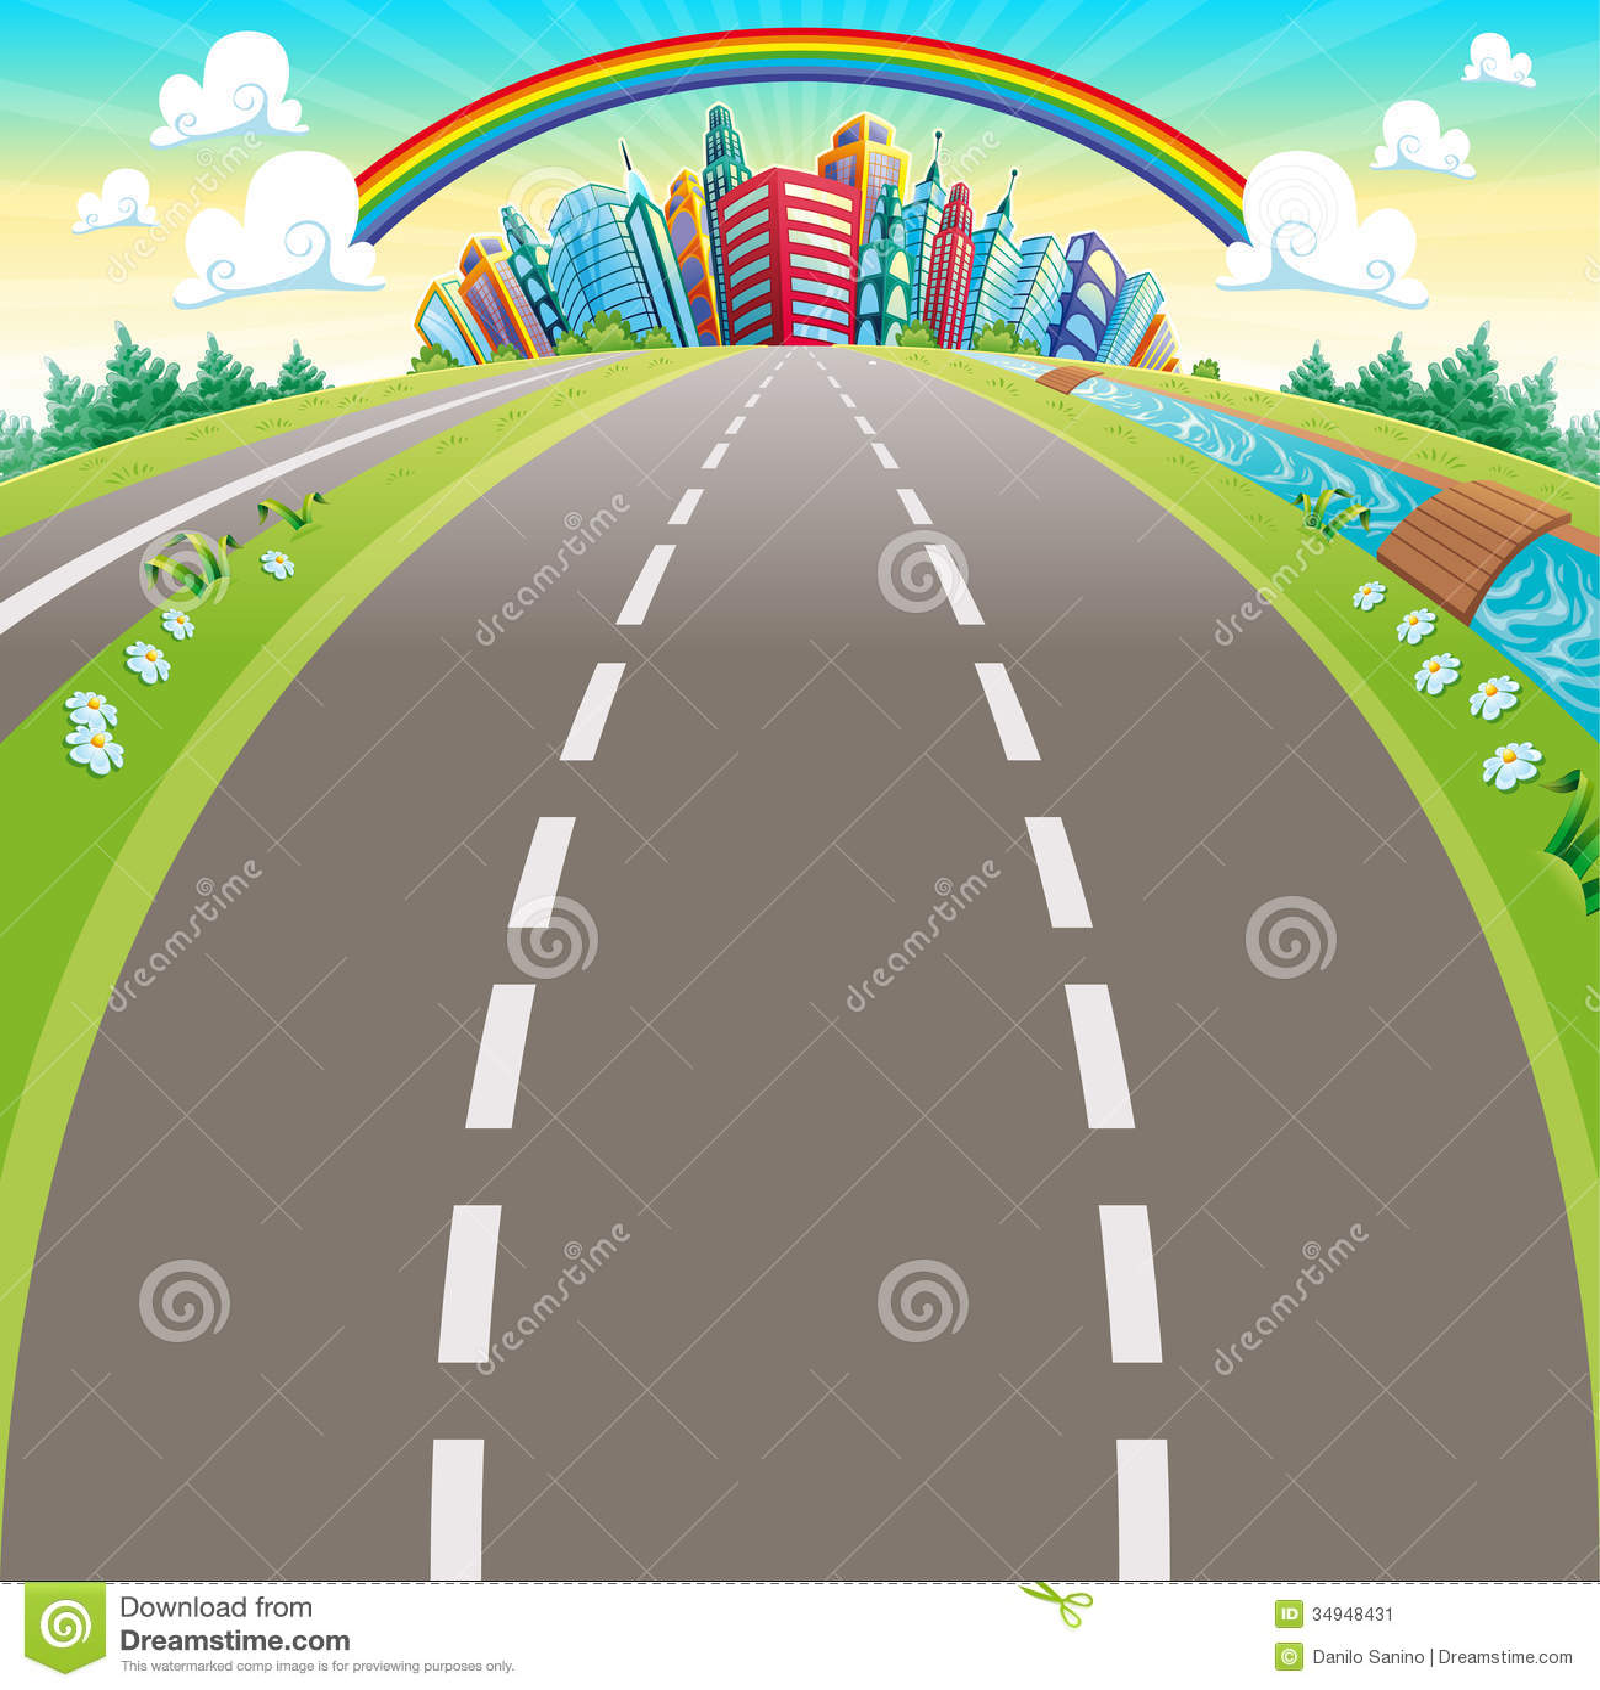 roads to the city stock vector illustration of town 34948431 rh dreamstime com cartoon roadsters cartoon roadkill